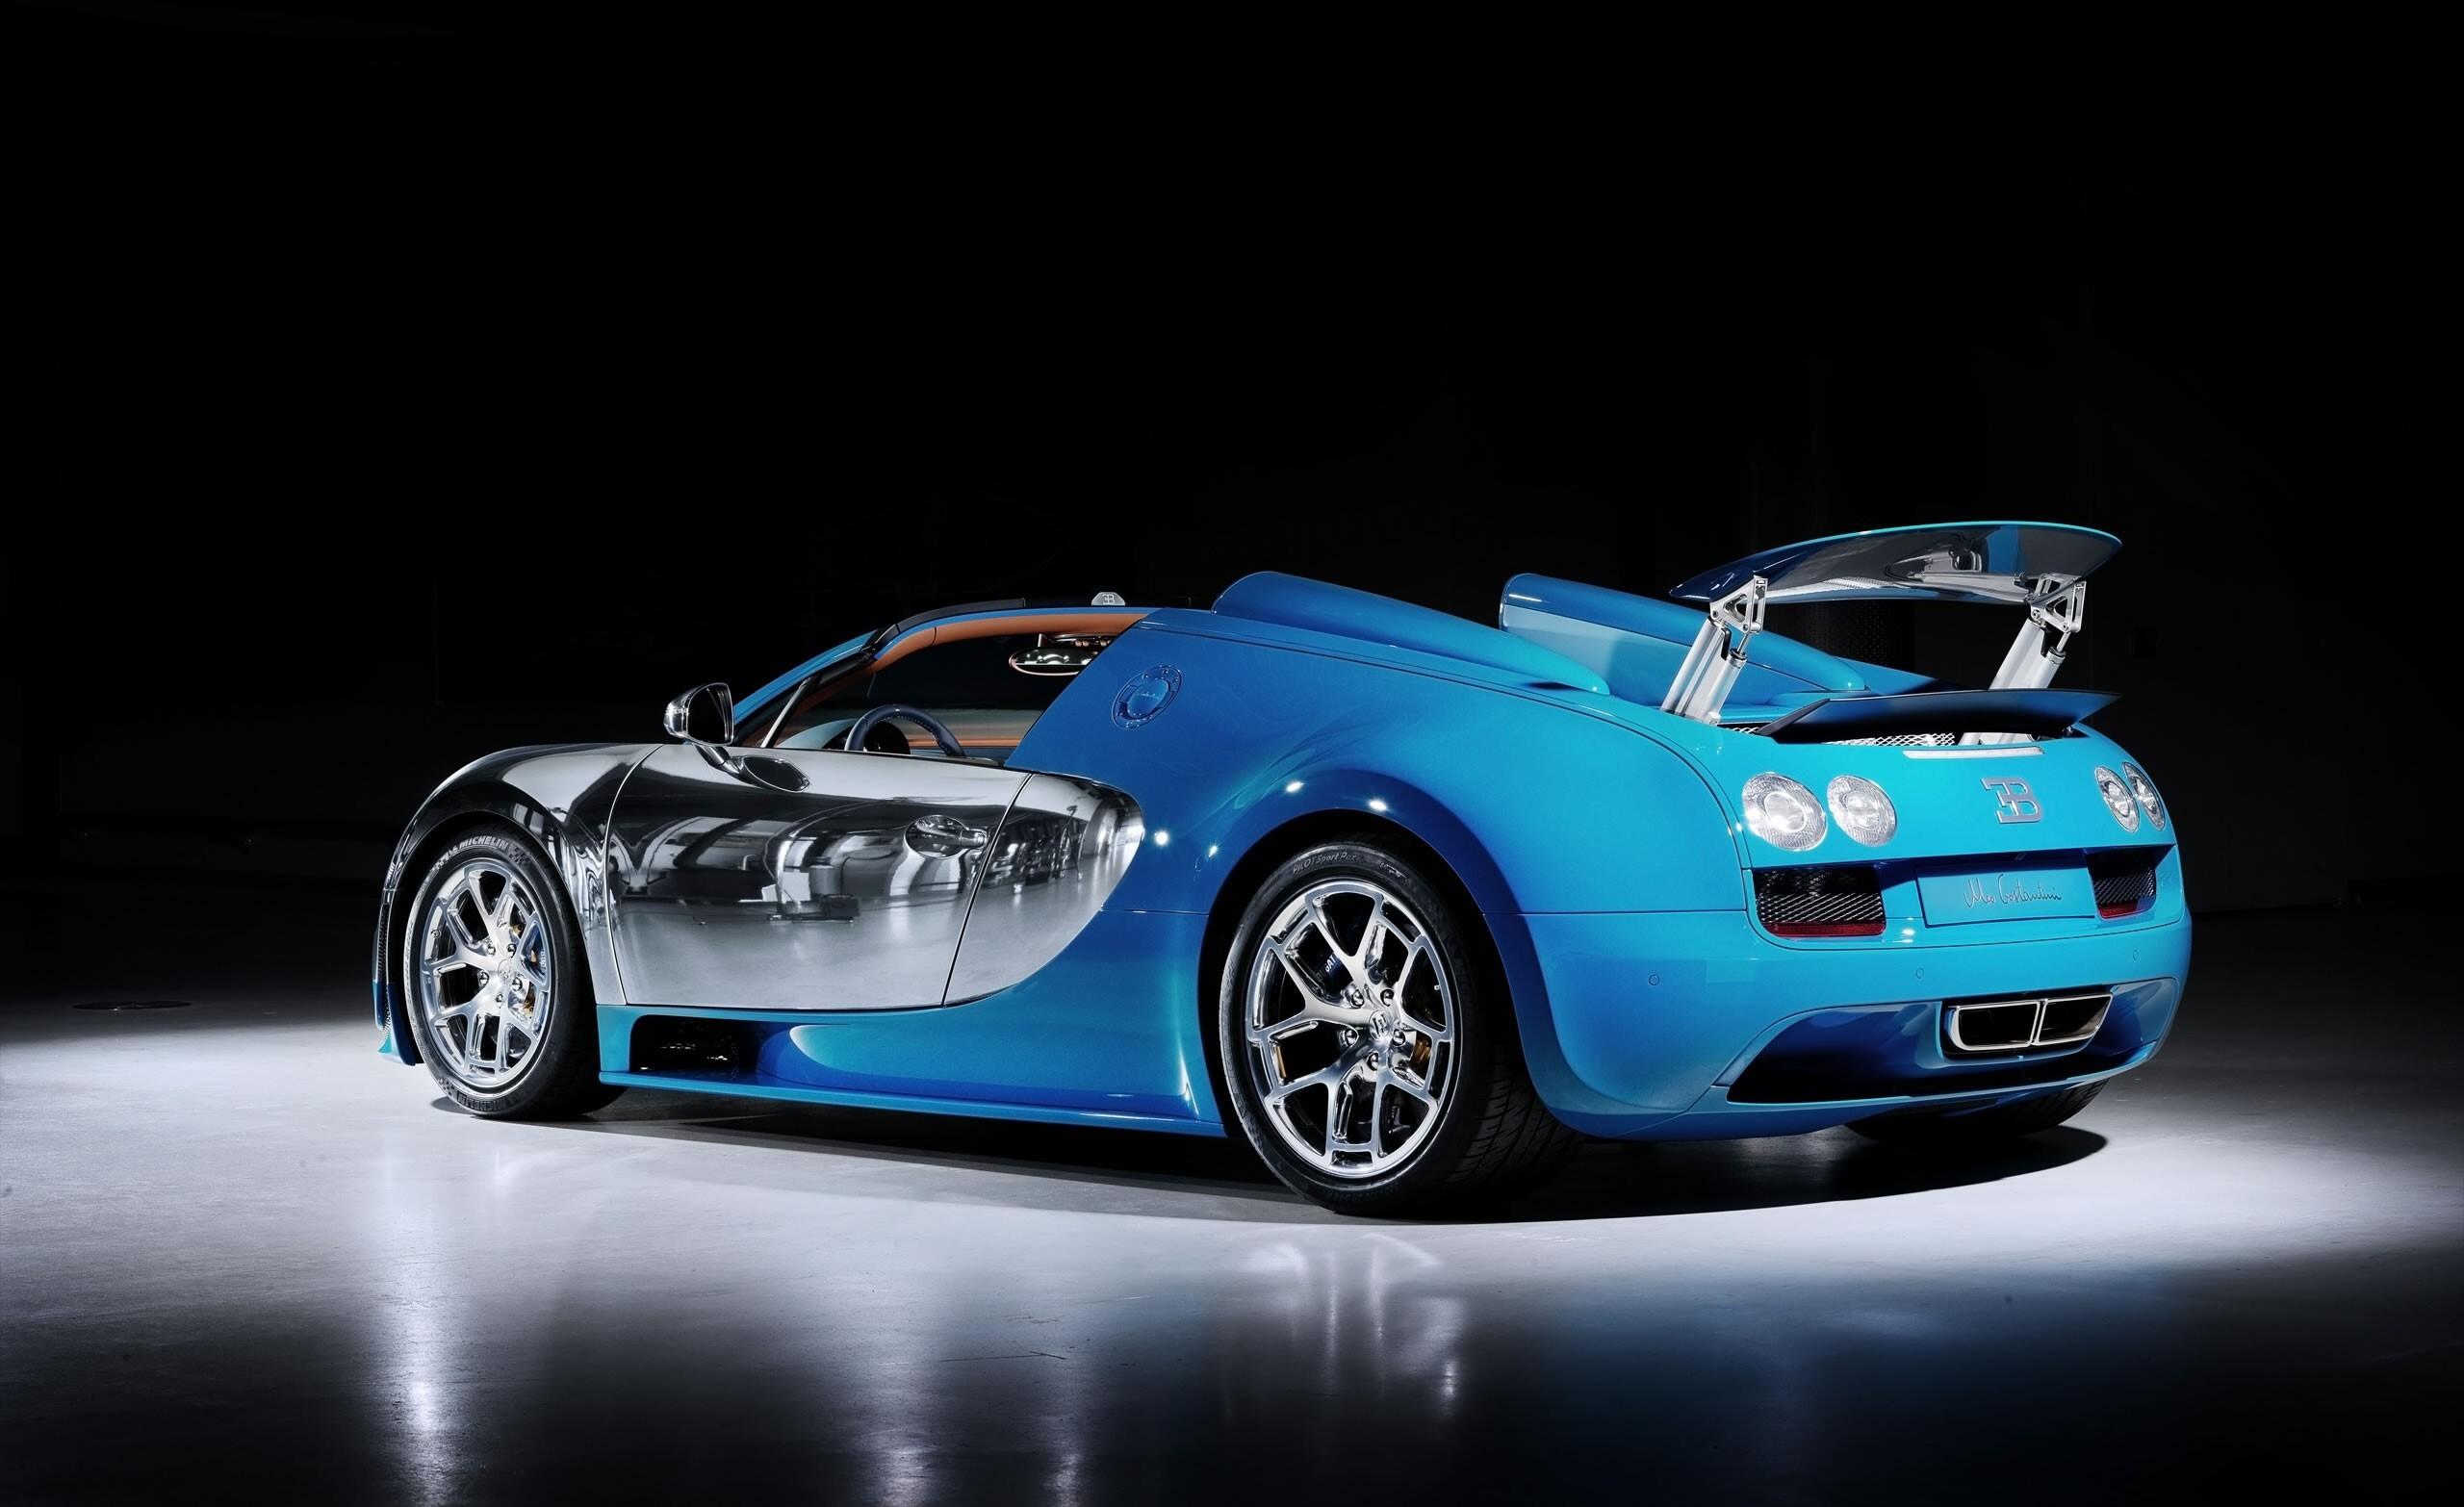 Meo Costantini Bugatti Veyron Hd Nice Cars Photos Hd Wallpapers